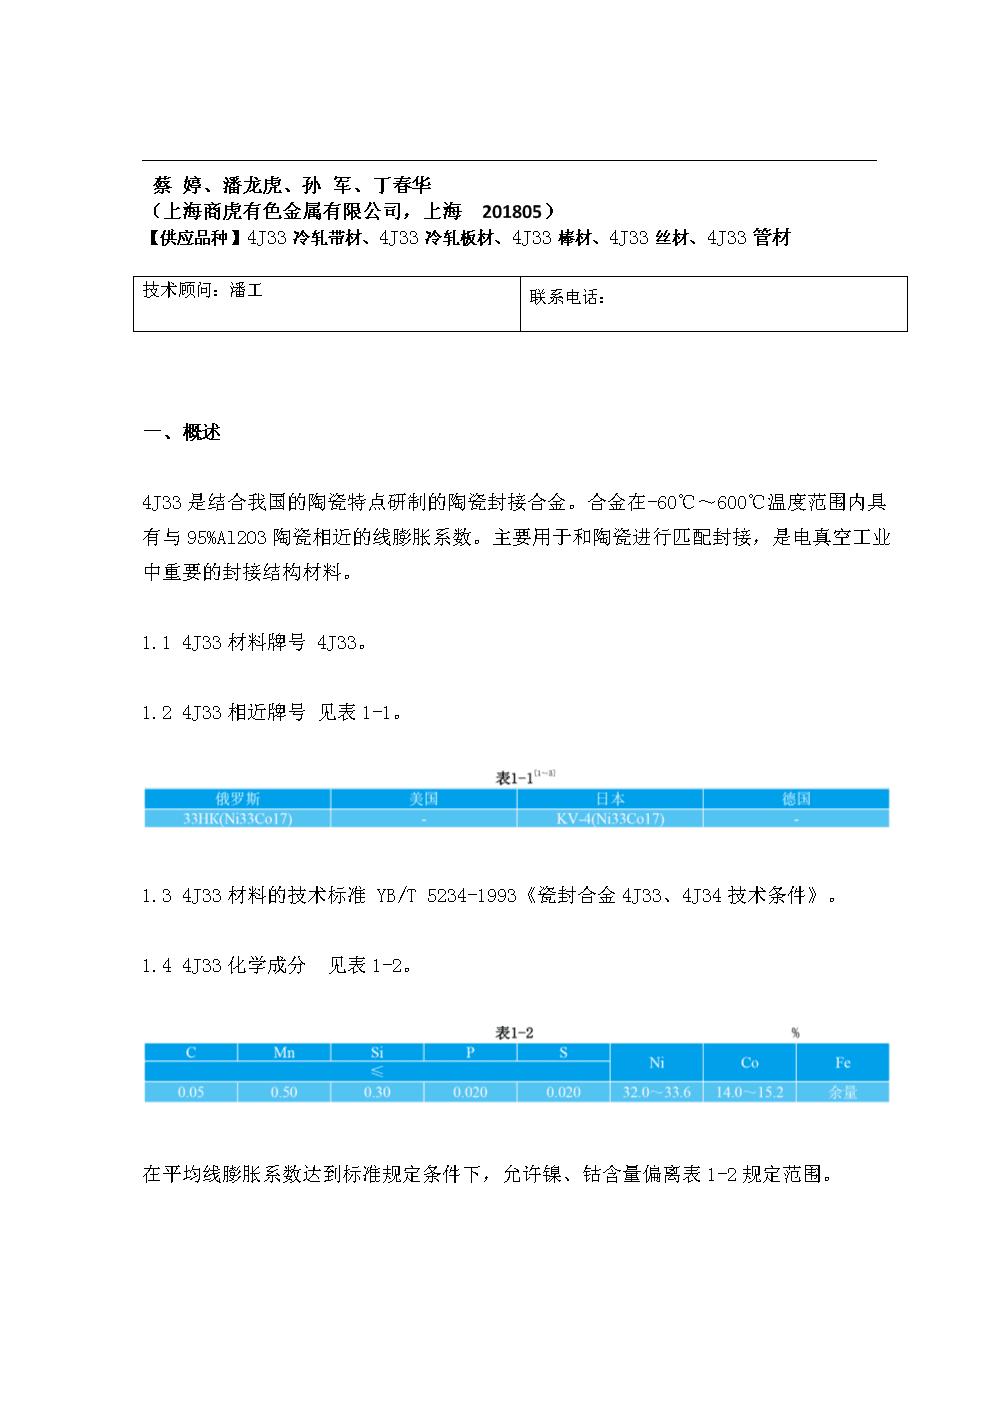 4J33封接结构材料-上海商虎合金技术.doc